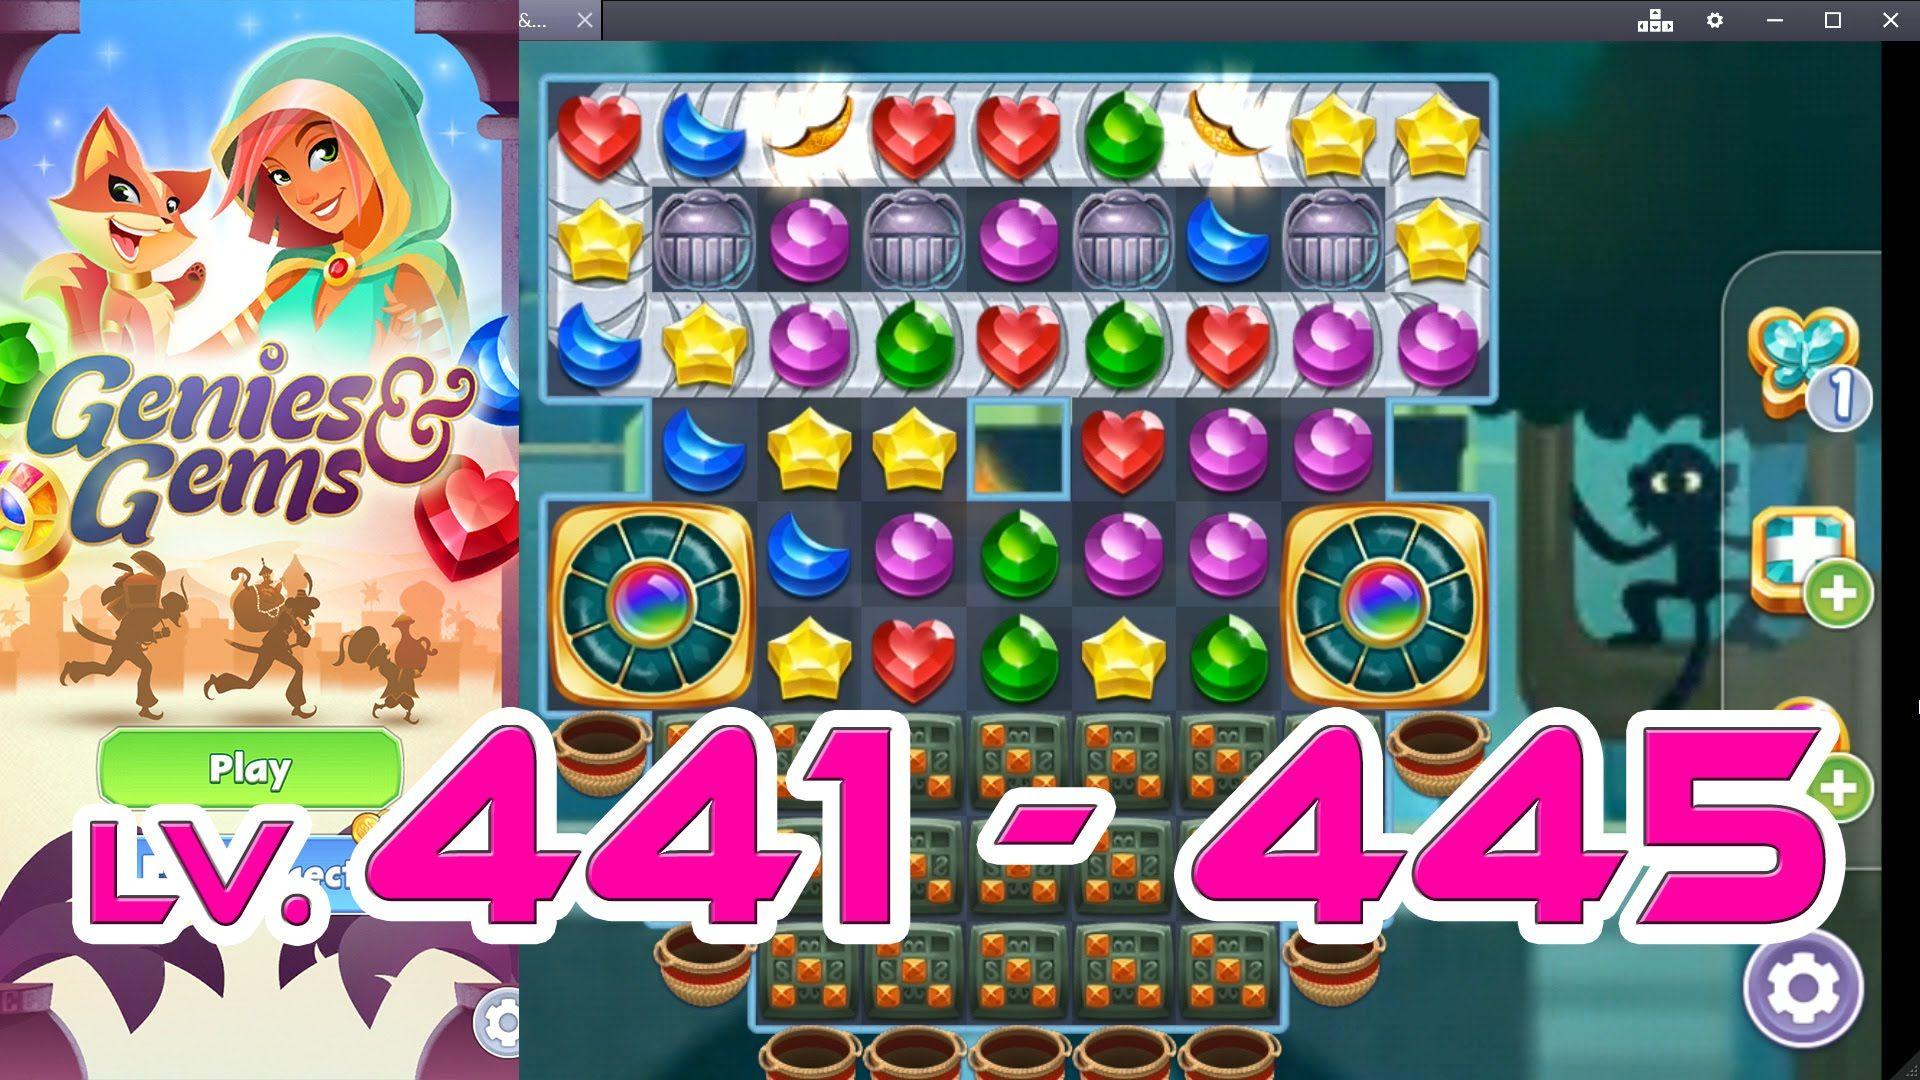 Genies & Gems - Level 441 - 445 (1080p/60fps)